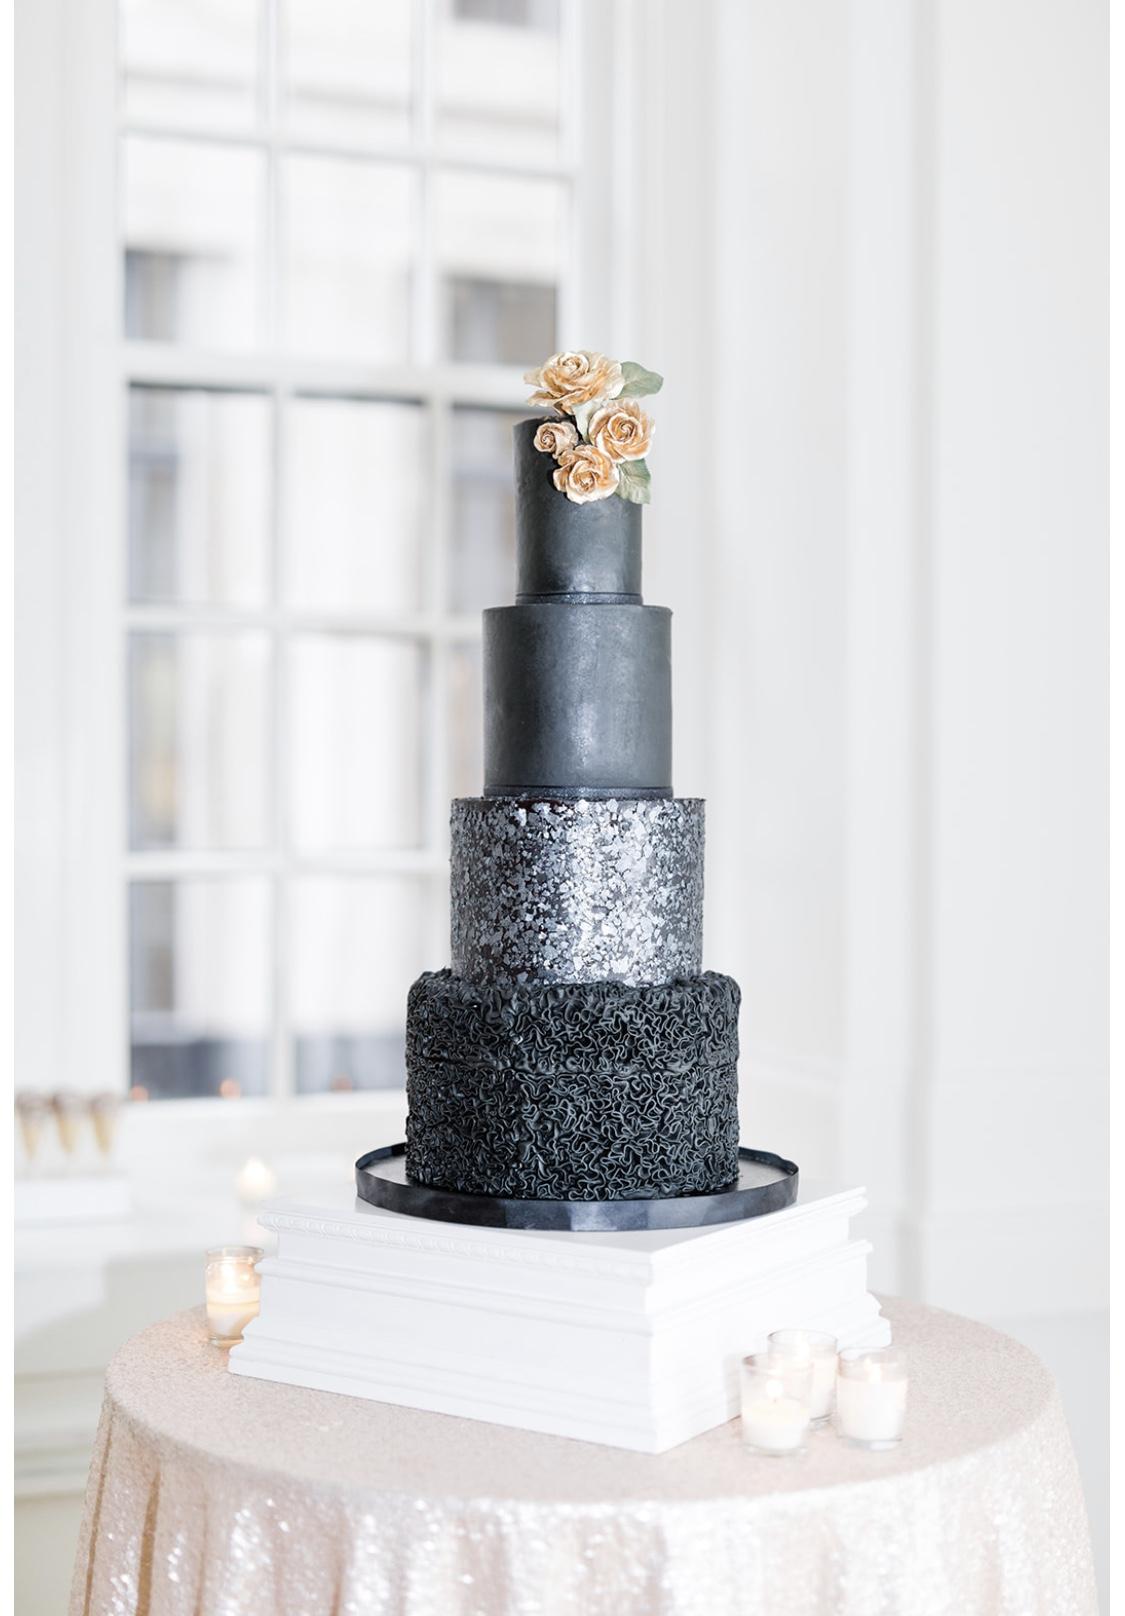 Meet Nashville wedding cake and dessert vendor, City Girl Treats on Nashville Bride Guide!